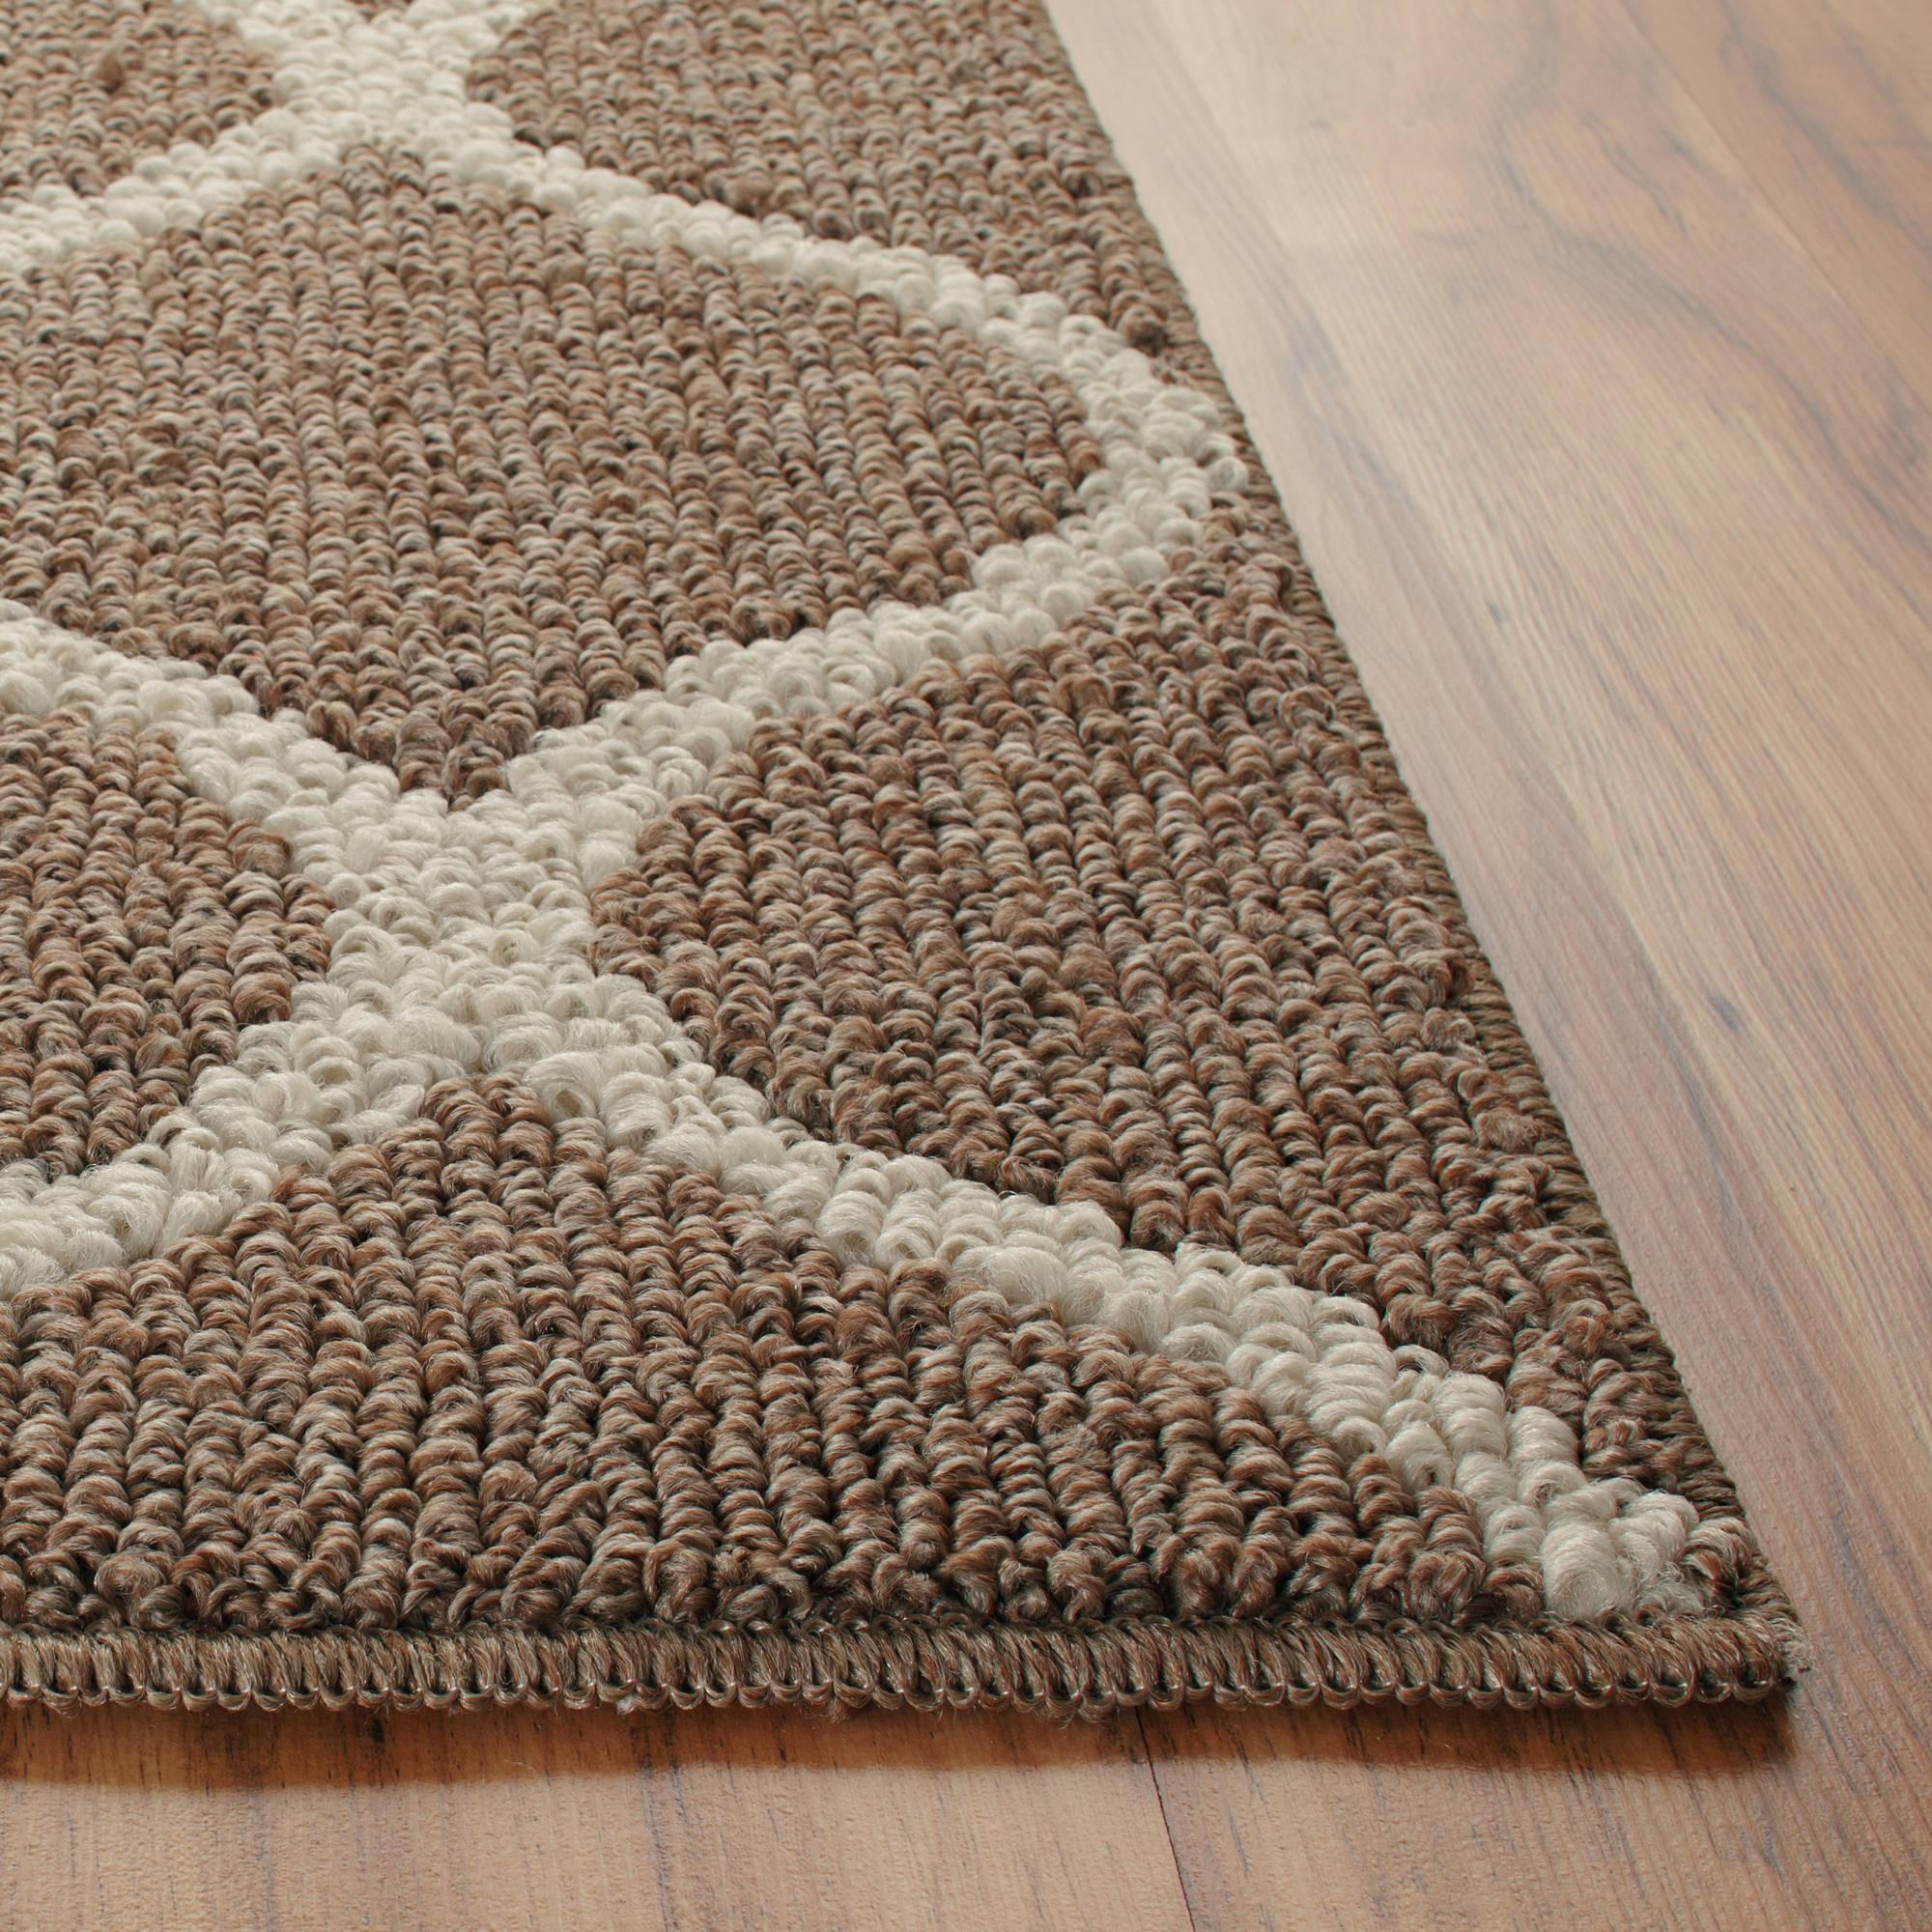 runner rug mainstays sheridan 3-piece area rug set - walmart.com IEYHPVL